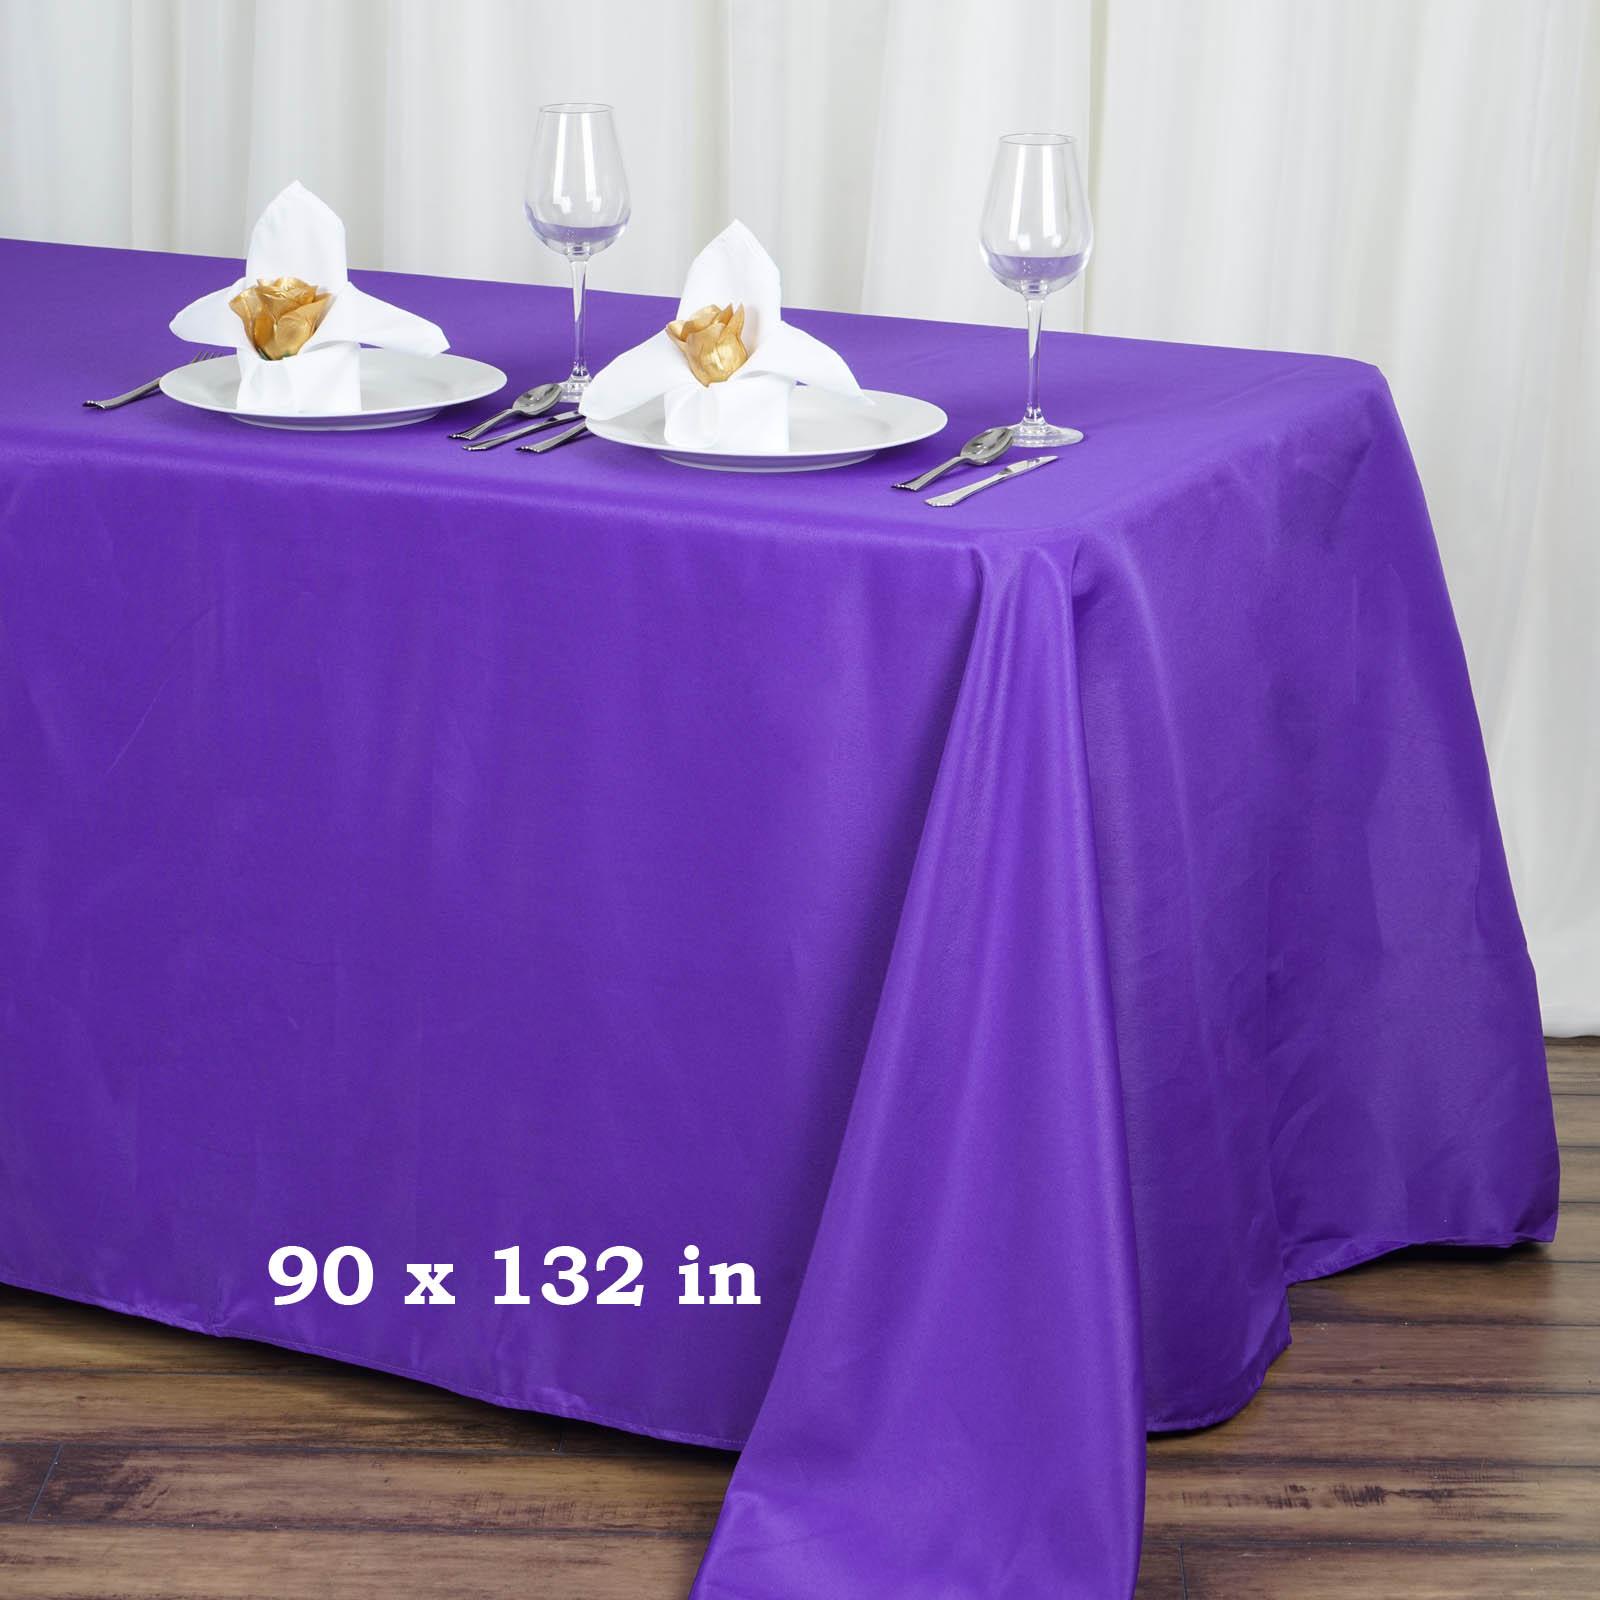 "BalsaCircle 90"" x 132"" Rectangular Polyester Tablecloth for Party Wedding... by BalsaCircle"